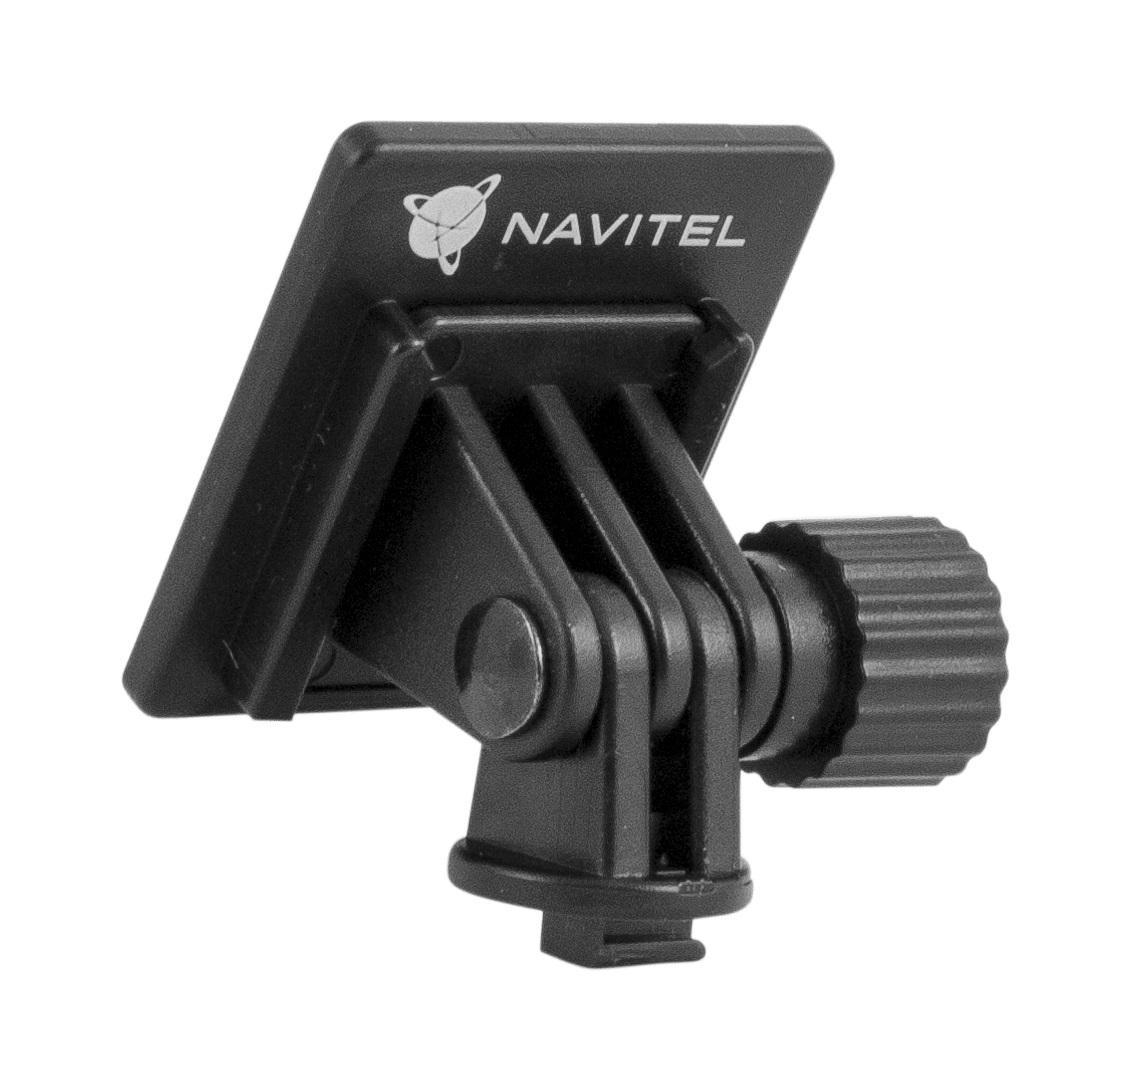 Dashcam NAVITEL NAVR400NV évaluation